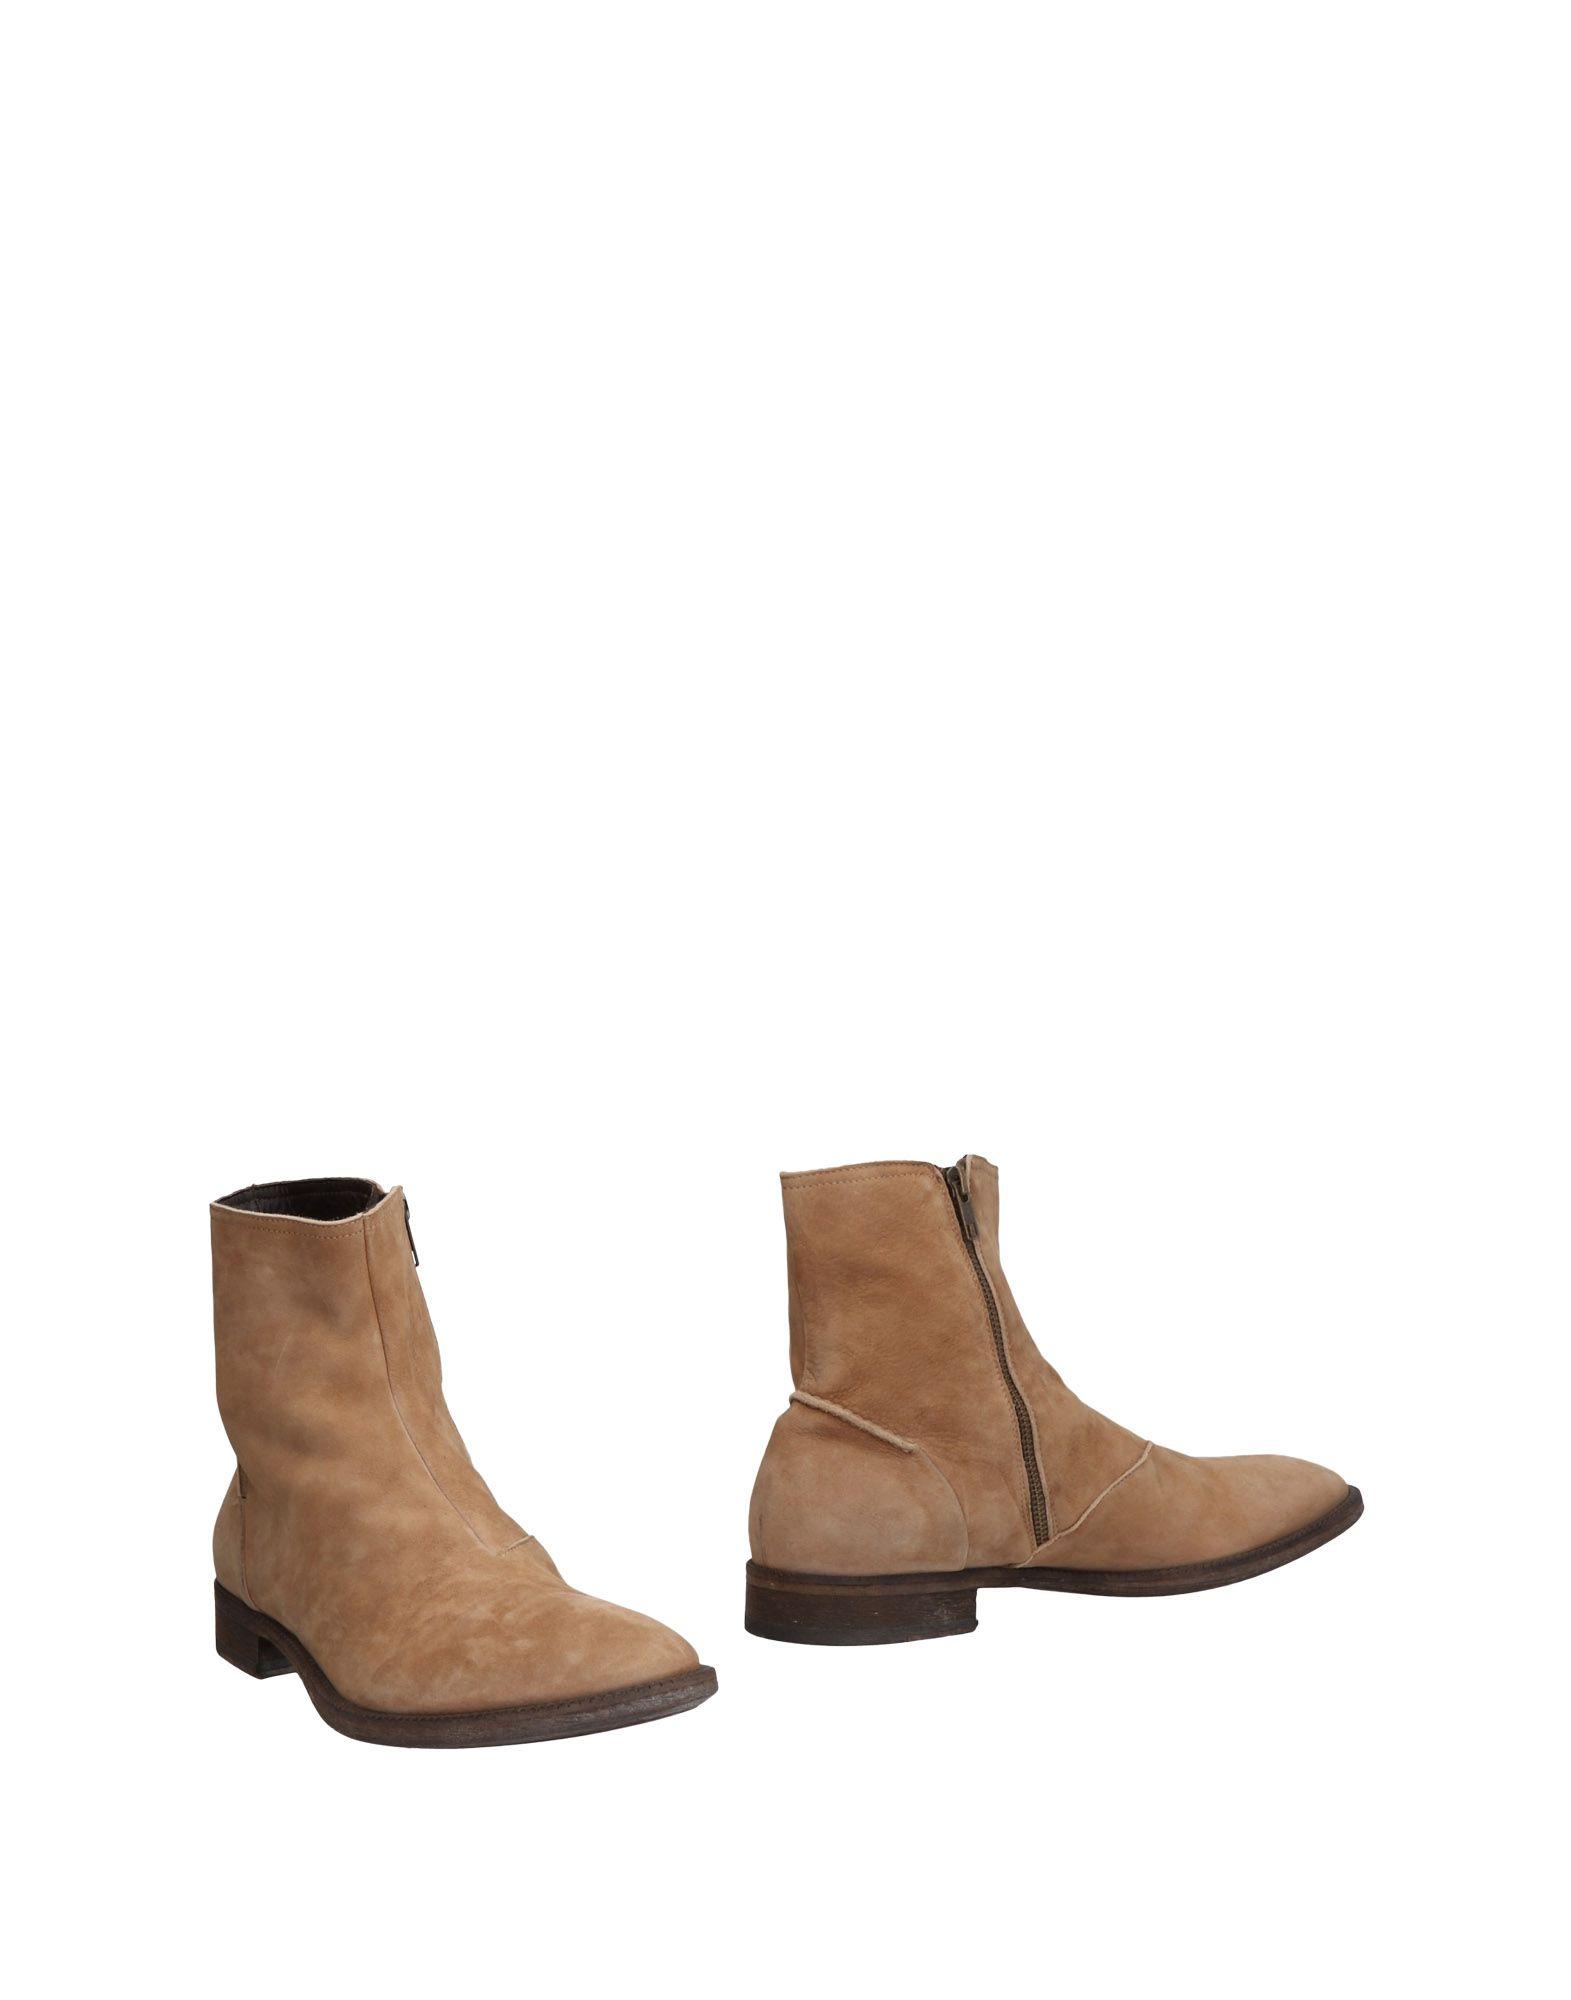 Giorgio Brato Stiefelette Herren  11461537TC Gute Qualität beliebte Schuhe